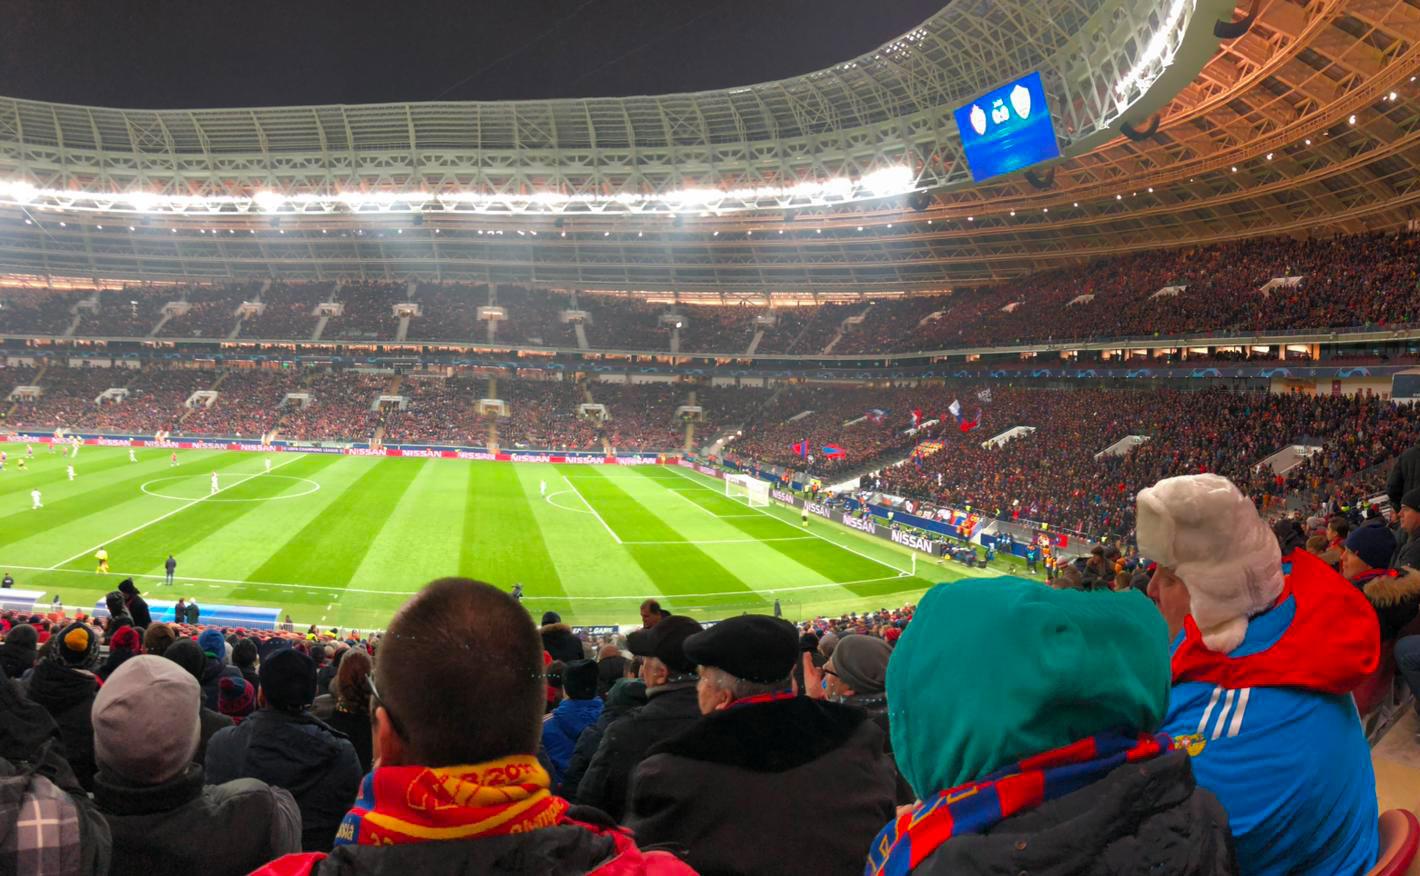 CSKA Mosca - Roma: panoramica dallo stadio